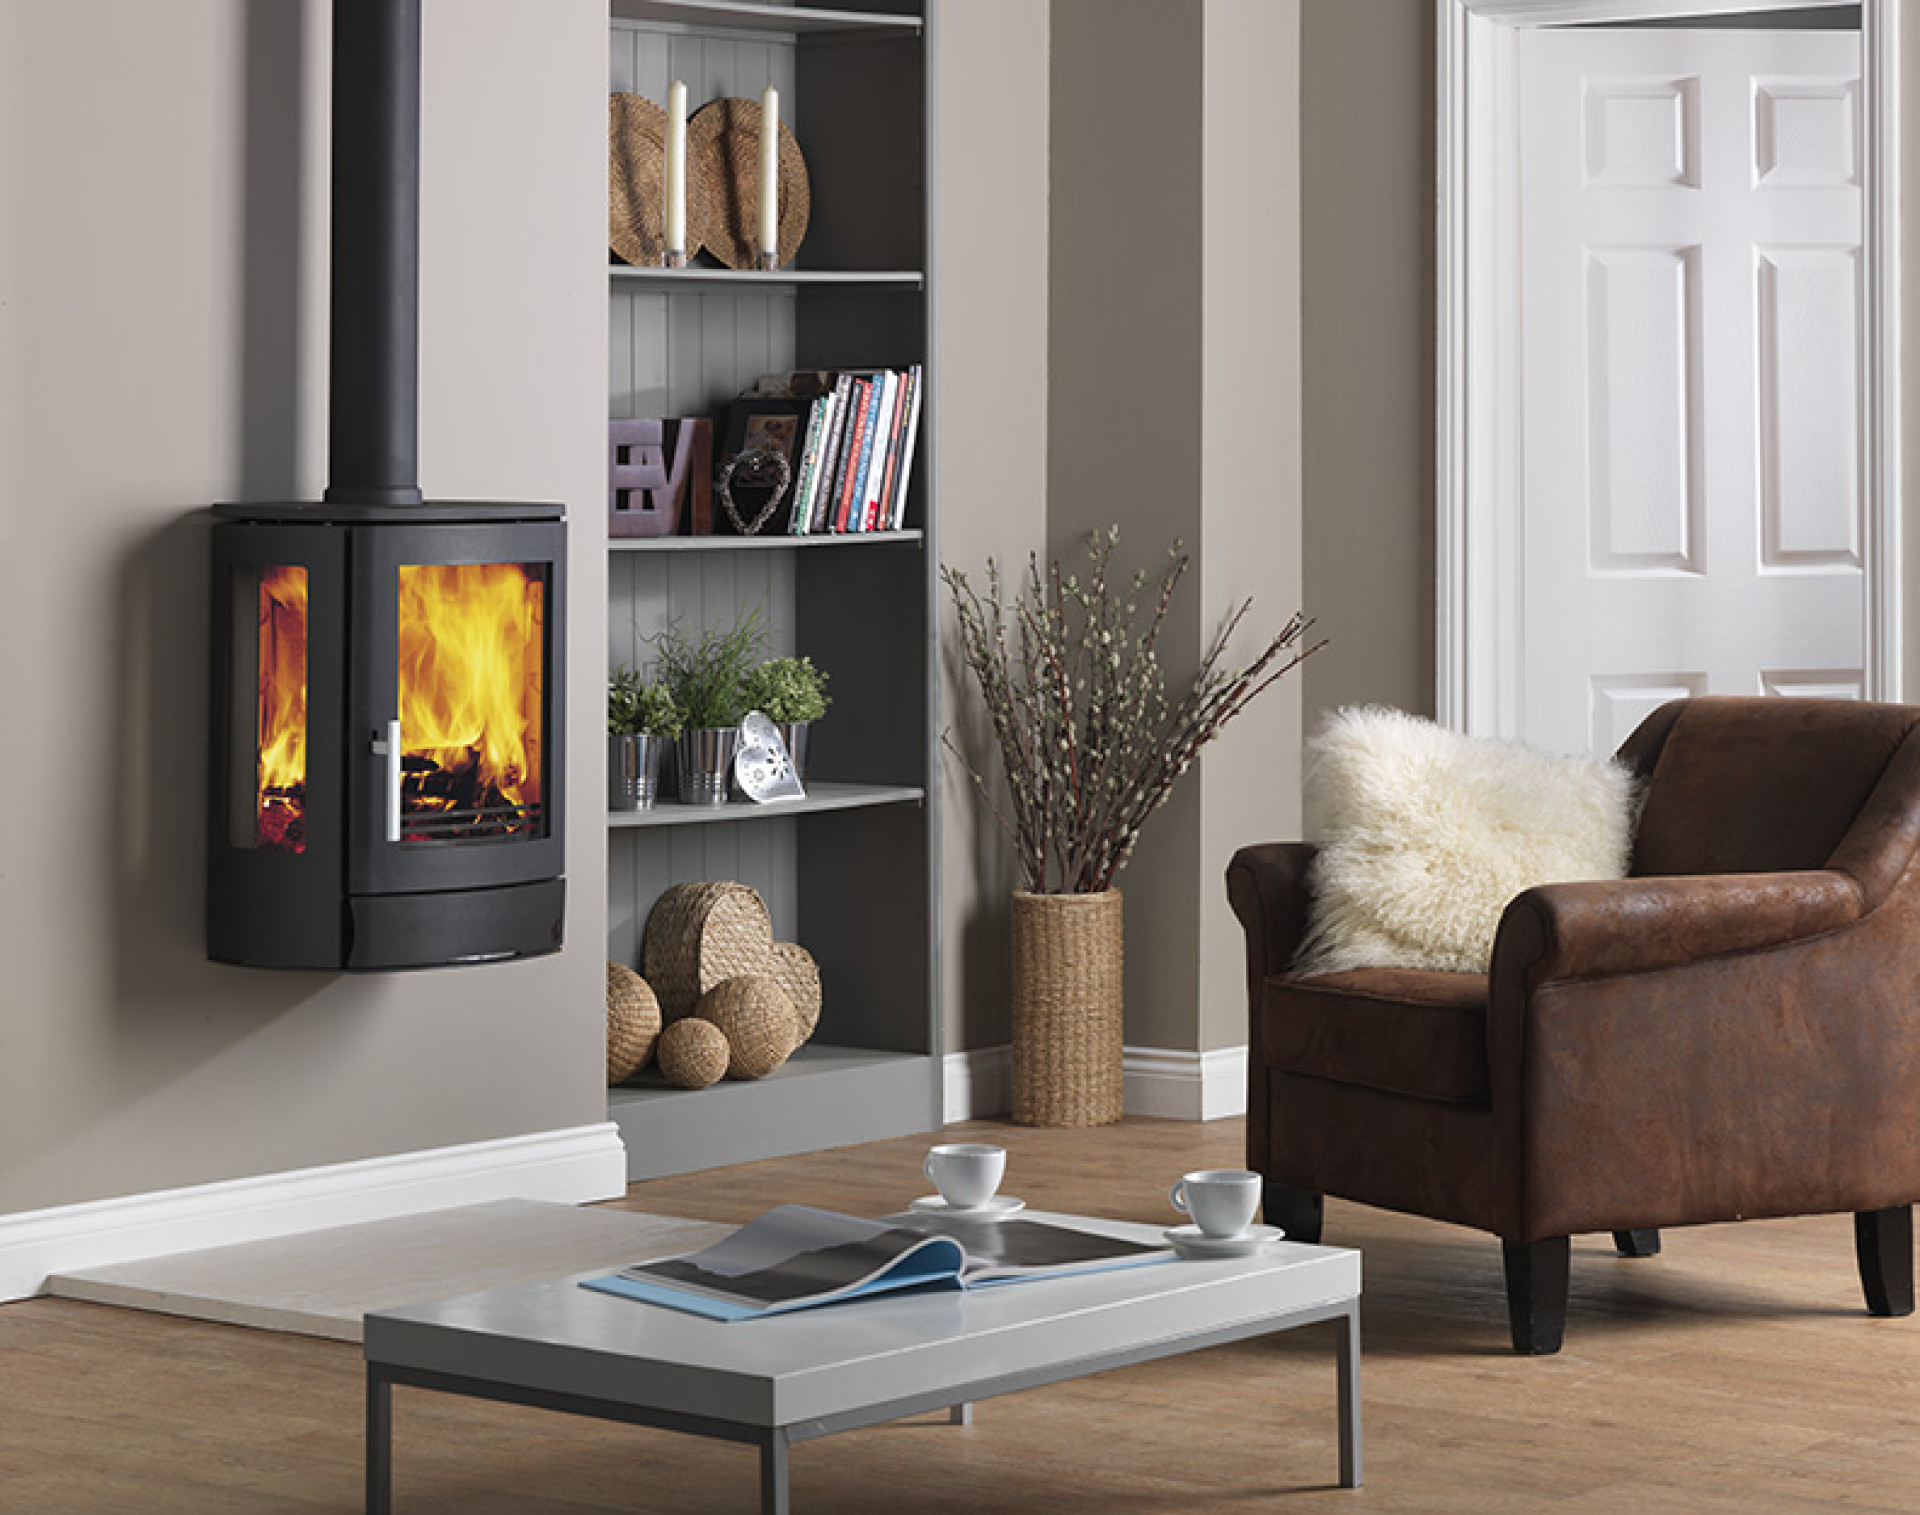 ACR NEO3W multifuel stove